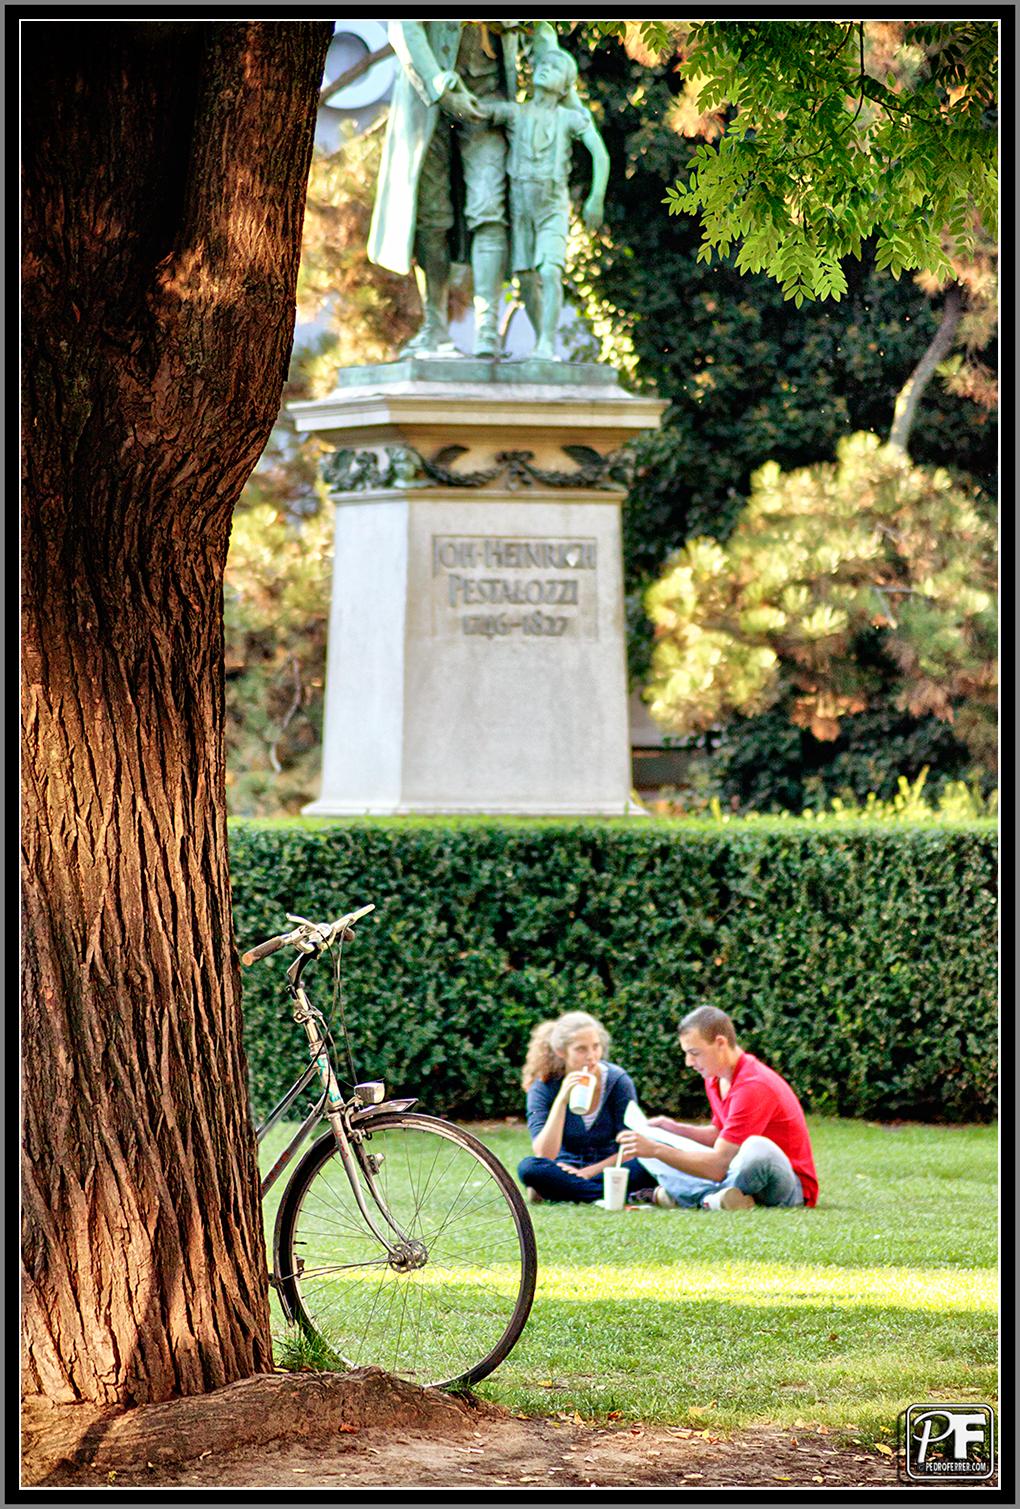 Zuriqueses - En el parque